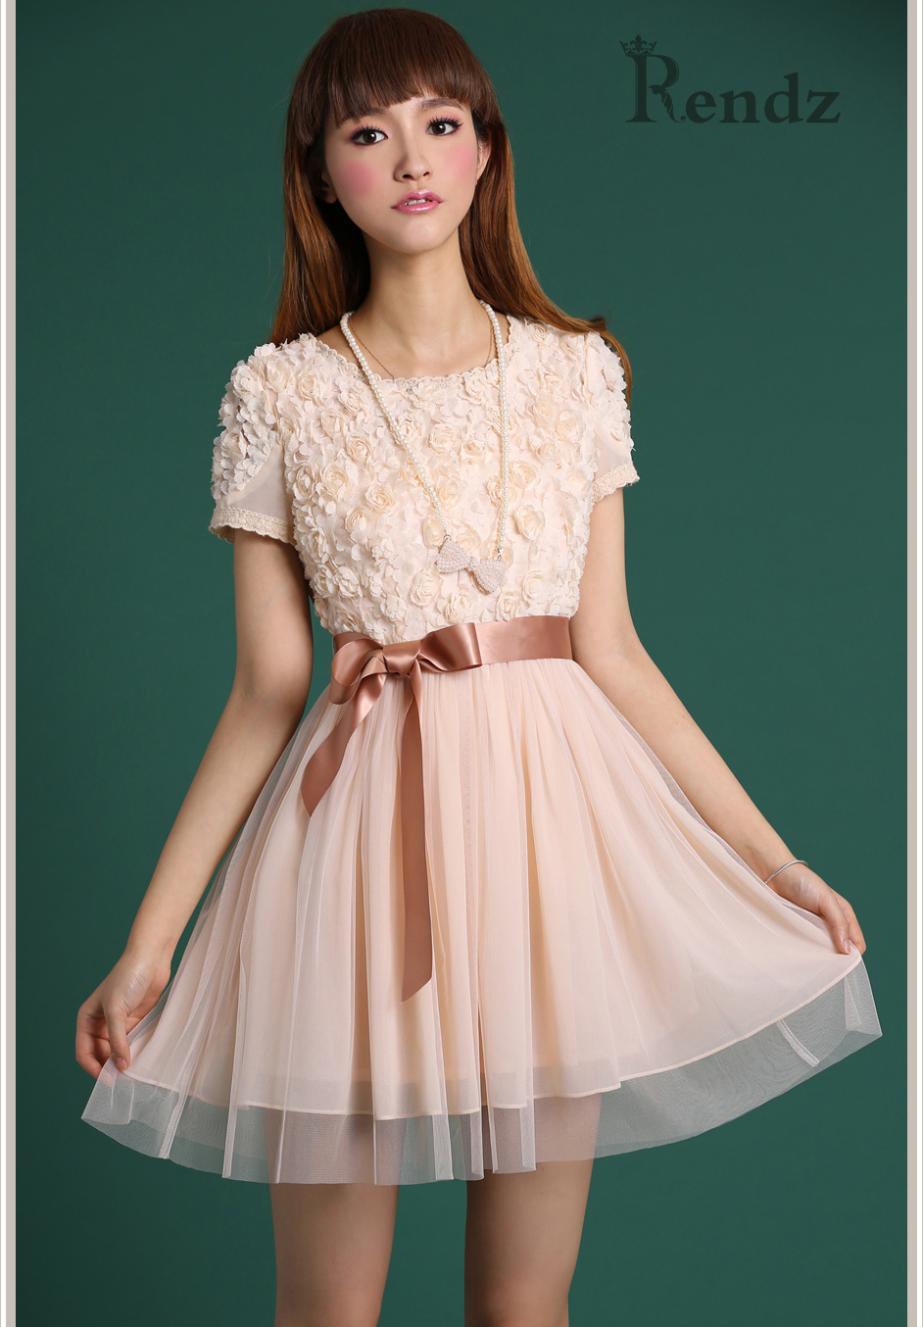 2015 Autumn Fashion Women Rose Flower Lace Dress Pink Slim Sexy Short Sleeve O-neck Mini Cute Dress(China (Mainland))